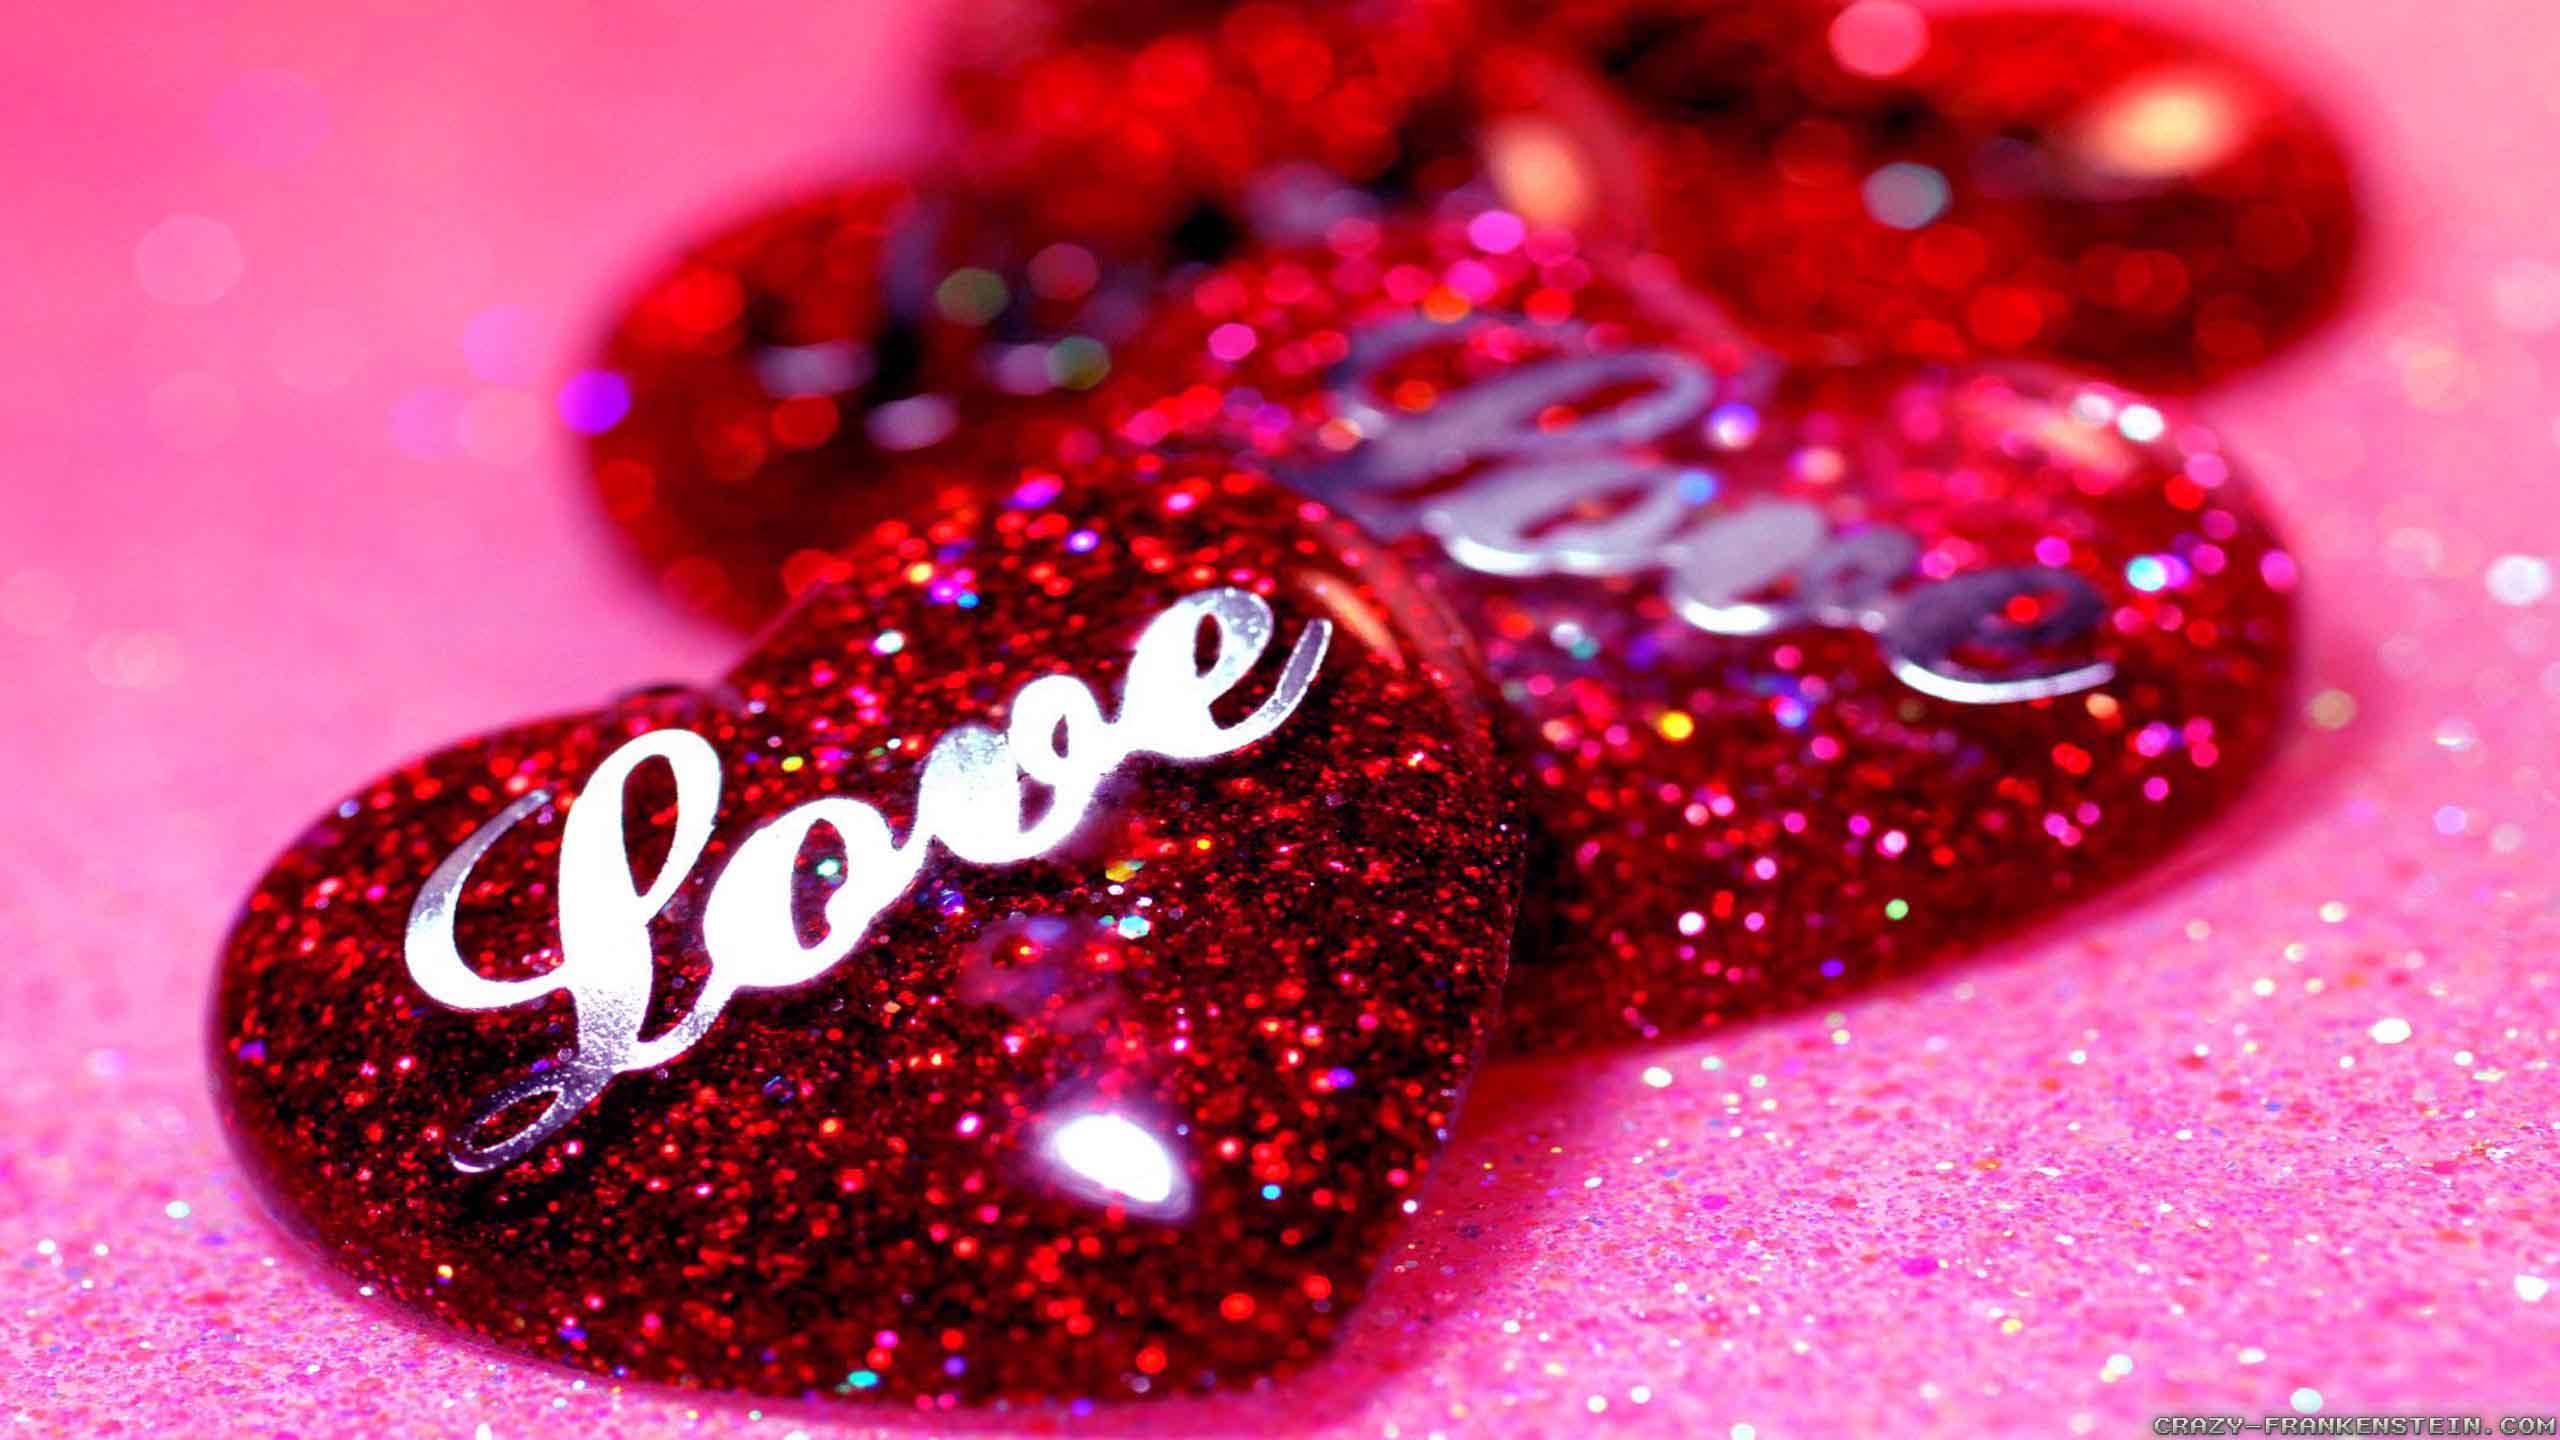 Wallpaper download new love - Latest Love Wallpapers Hd Download Hd Free Wallpapers Download